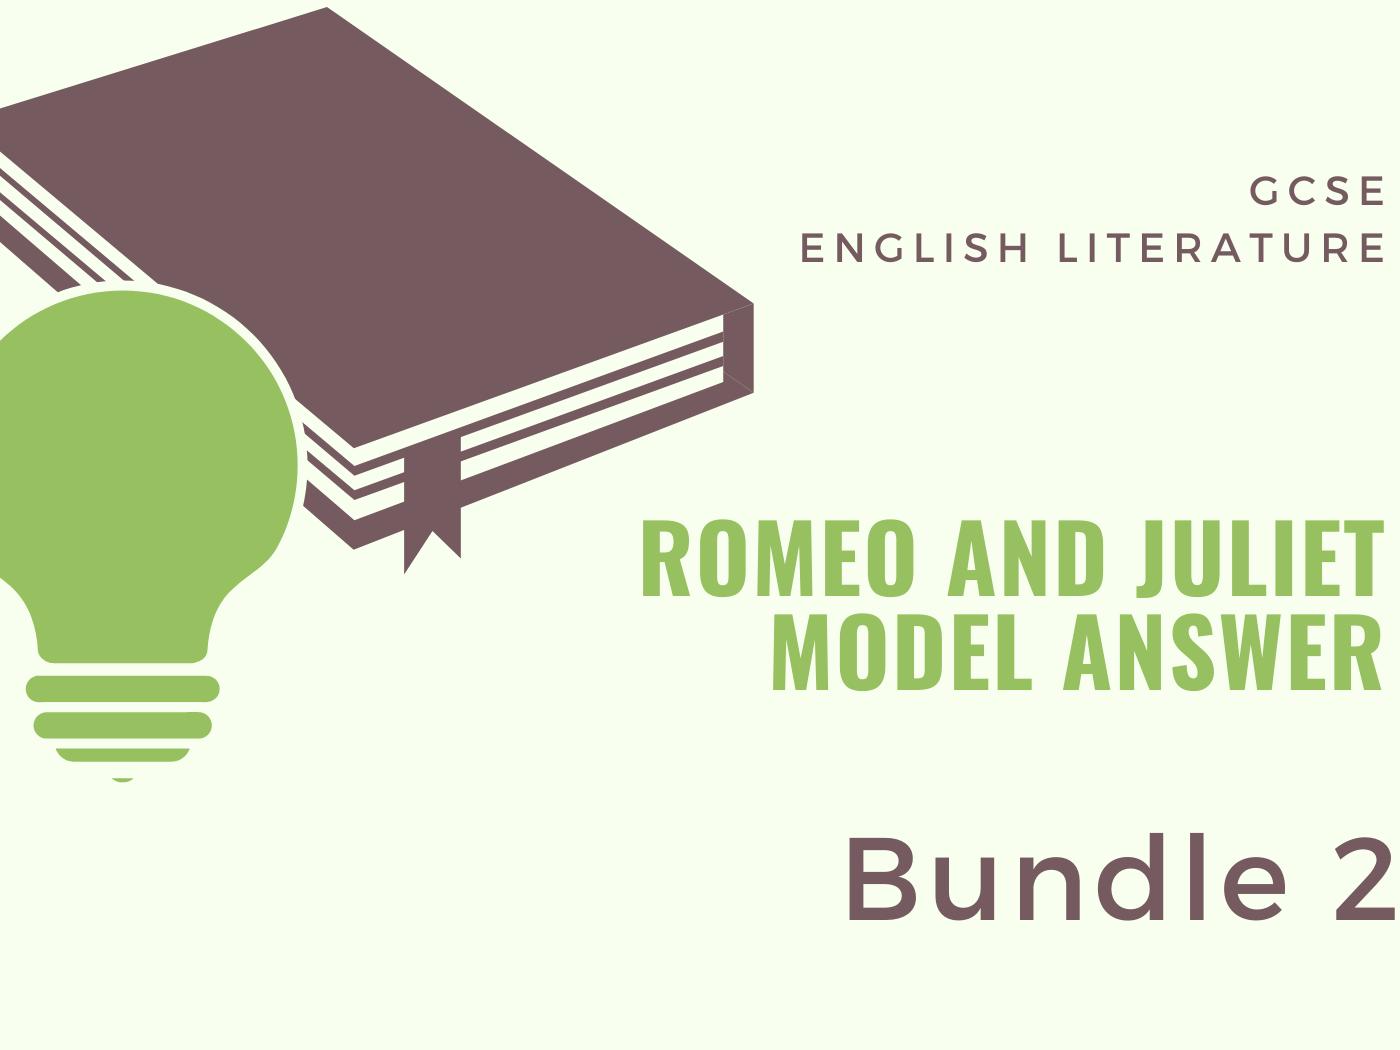 Romeo and Juliet: Model Answers - Bundle 2